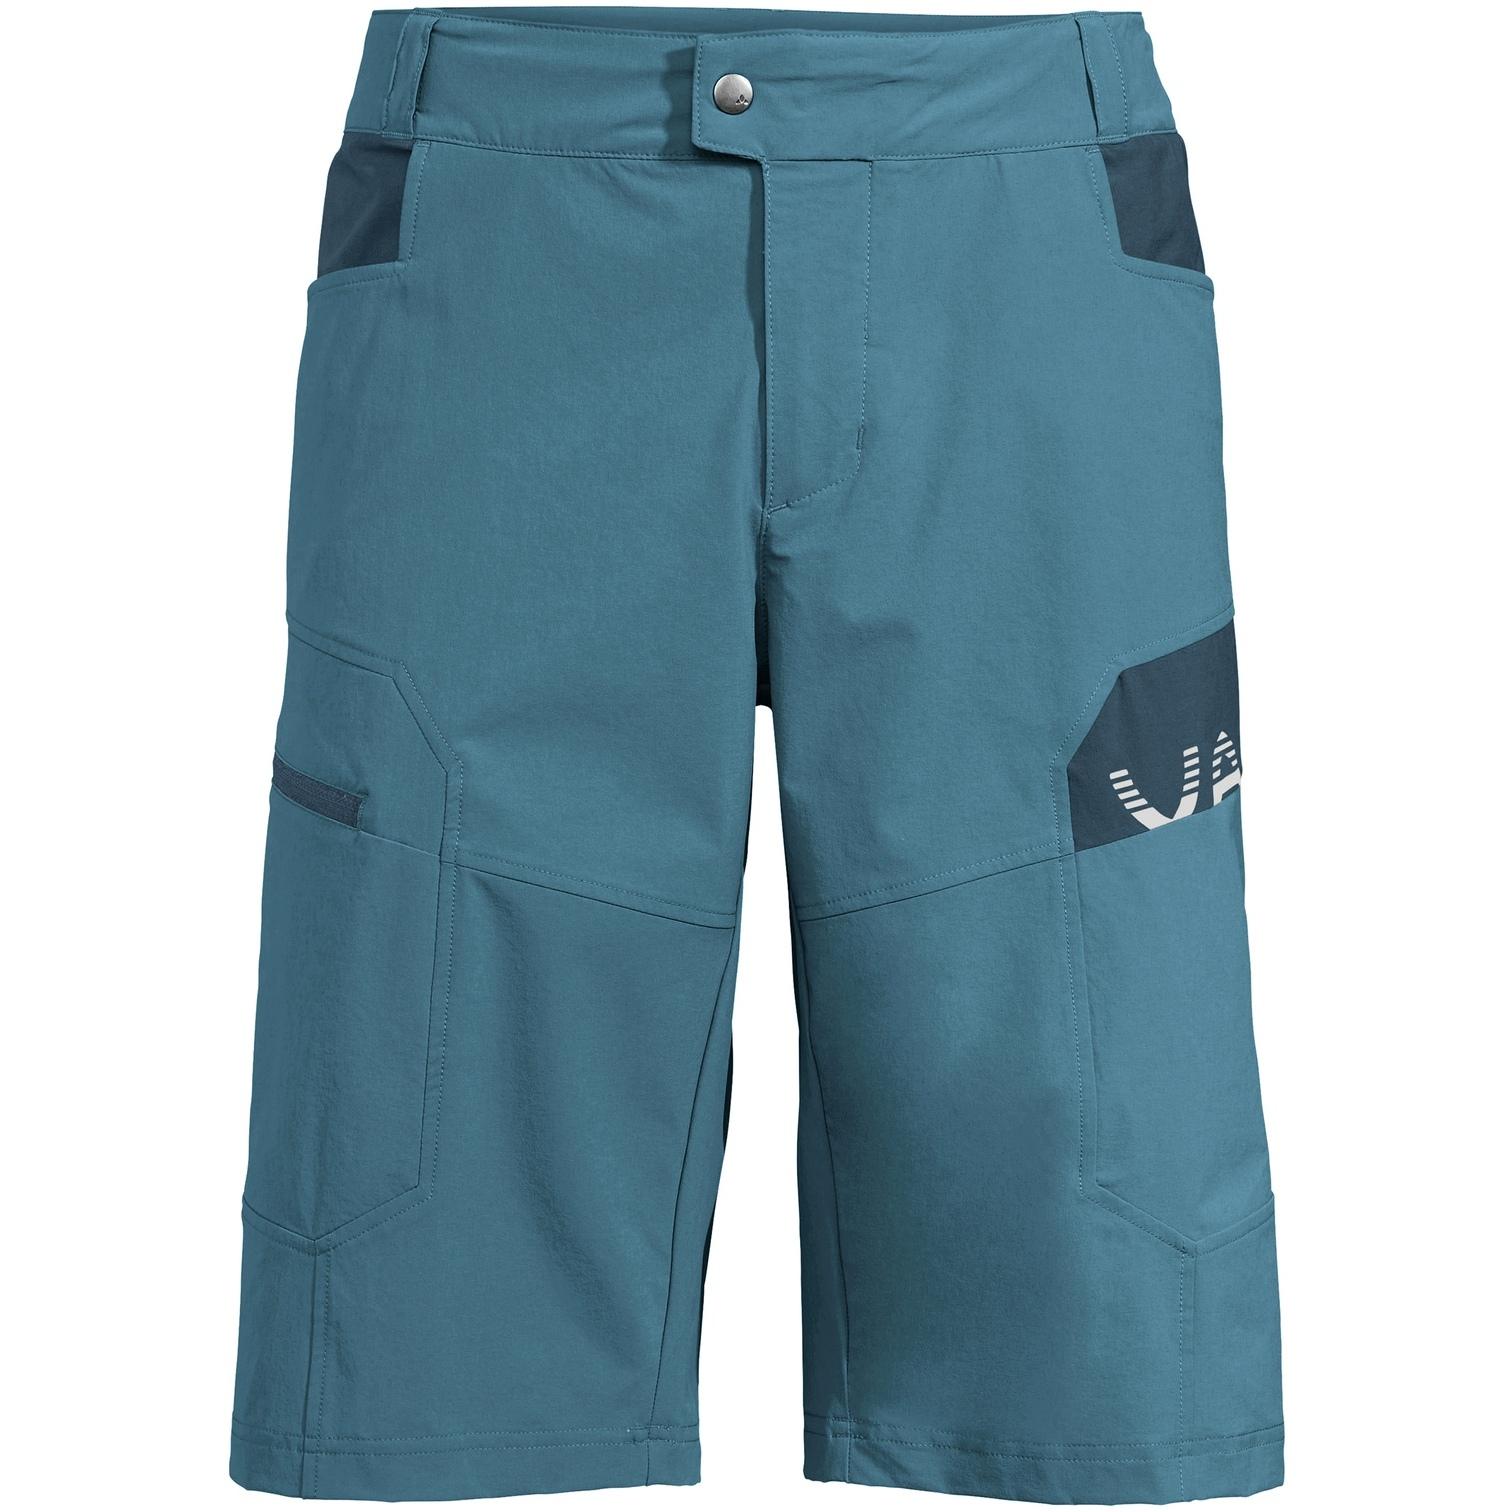 Vaude Altissimo Shorts III - blue grey